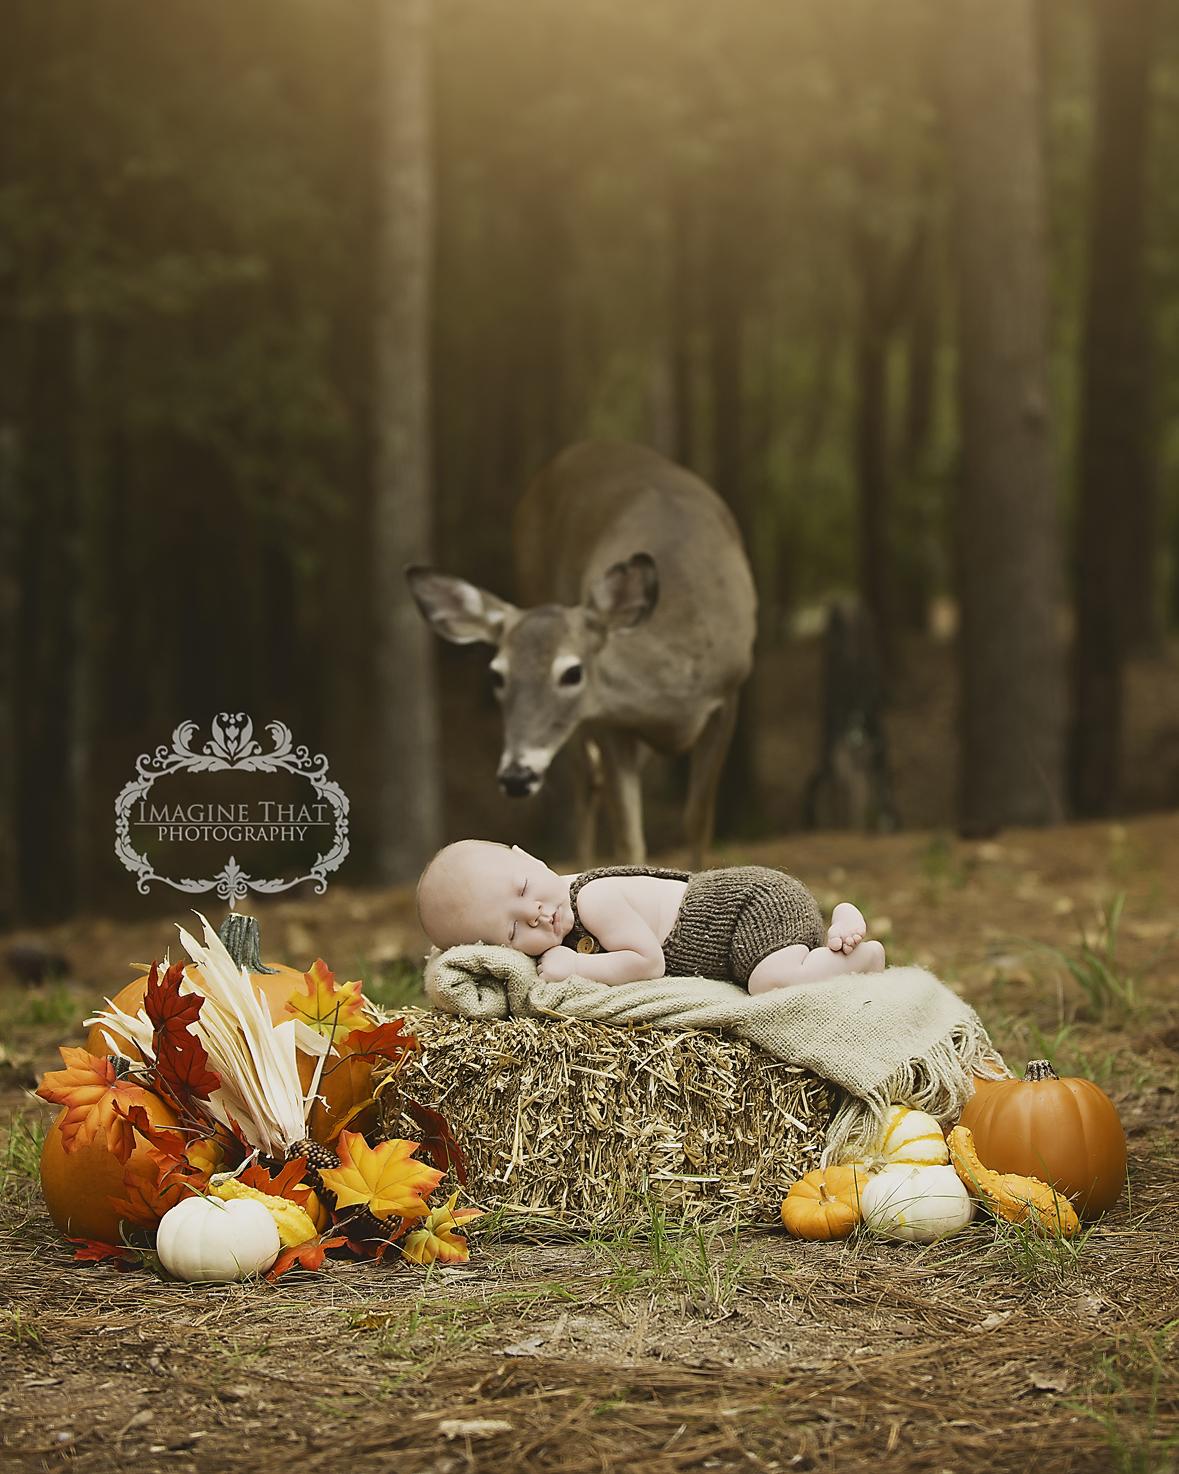 maggie-the-deer-photobombs-baby